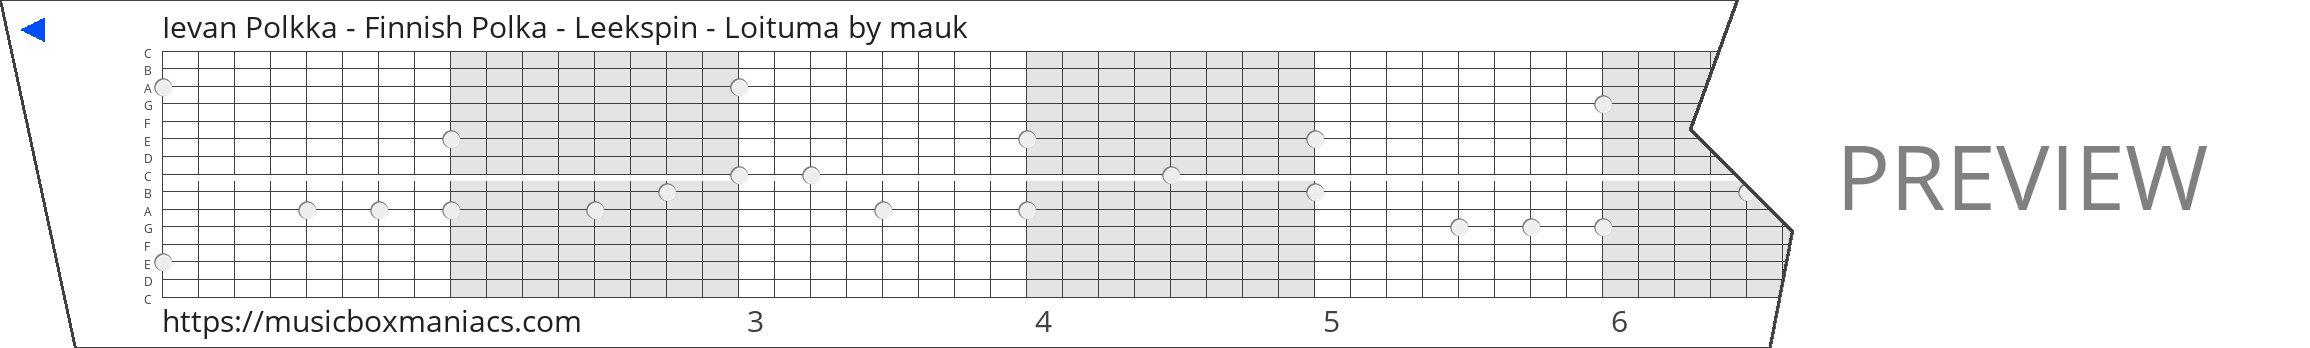 Ievan Polkka - Finnish Polka - Leekspin - Loituma 15 note music box paper strip